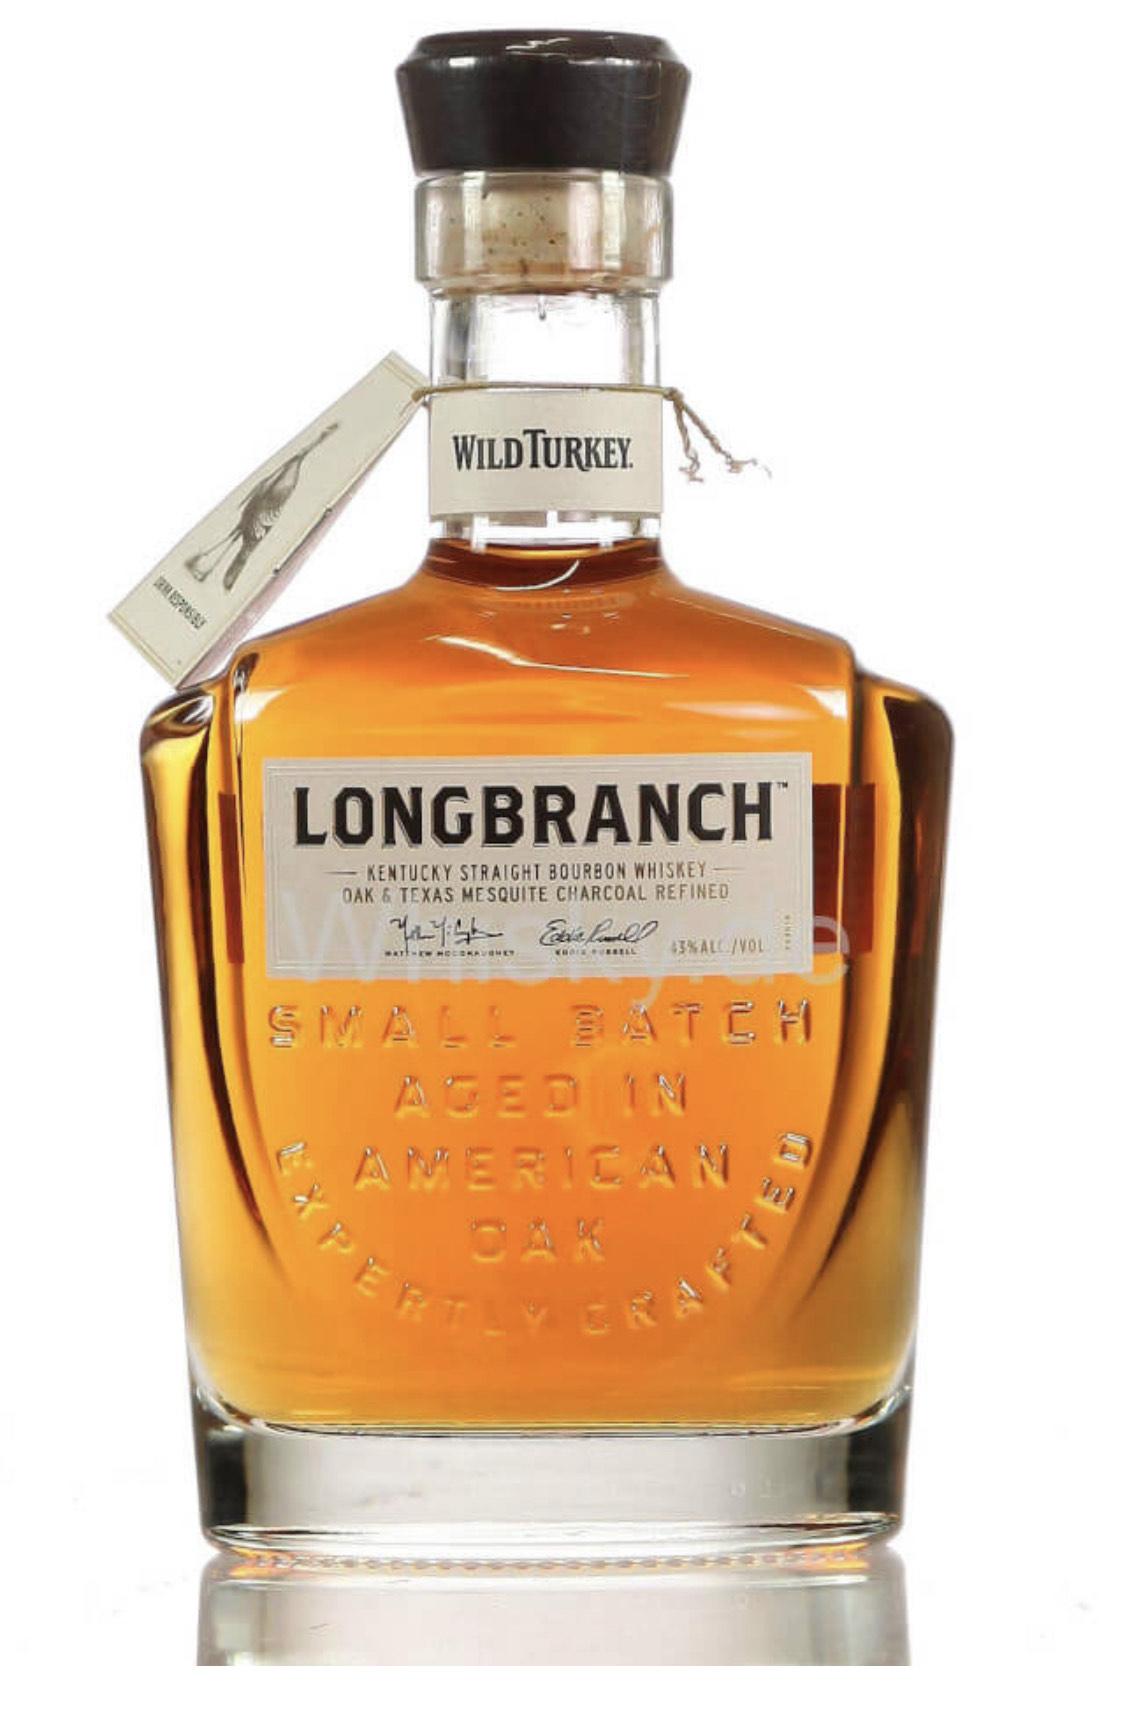 Wild Turkey Longbranch Kentucky Bourbon Whiskey (1L)